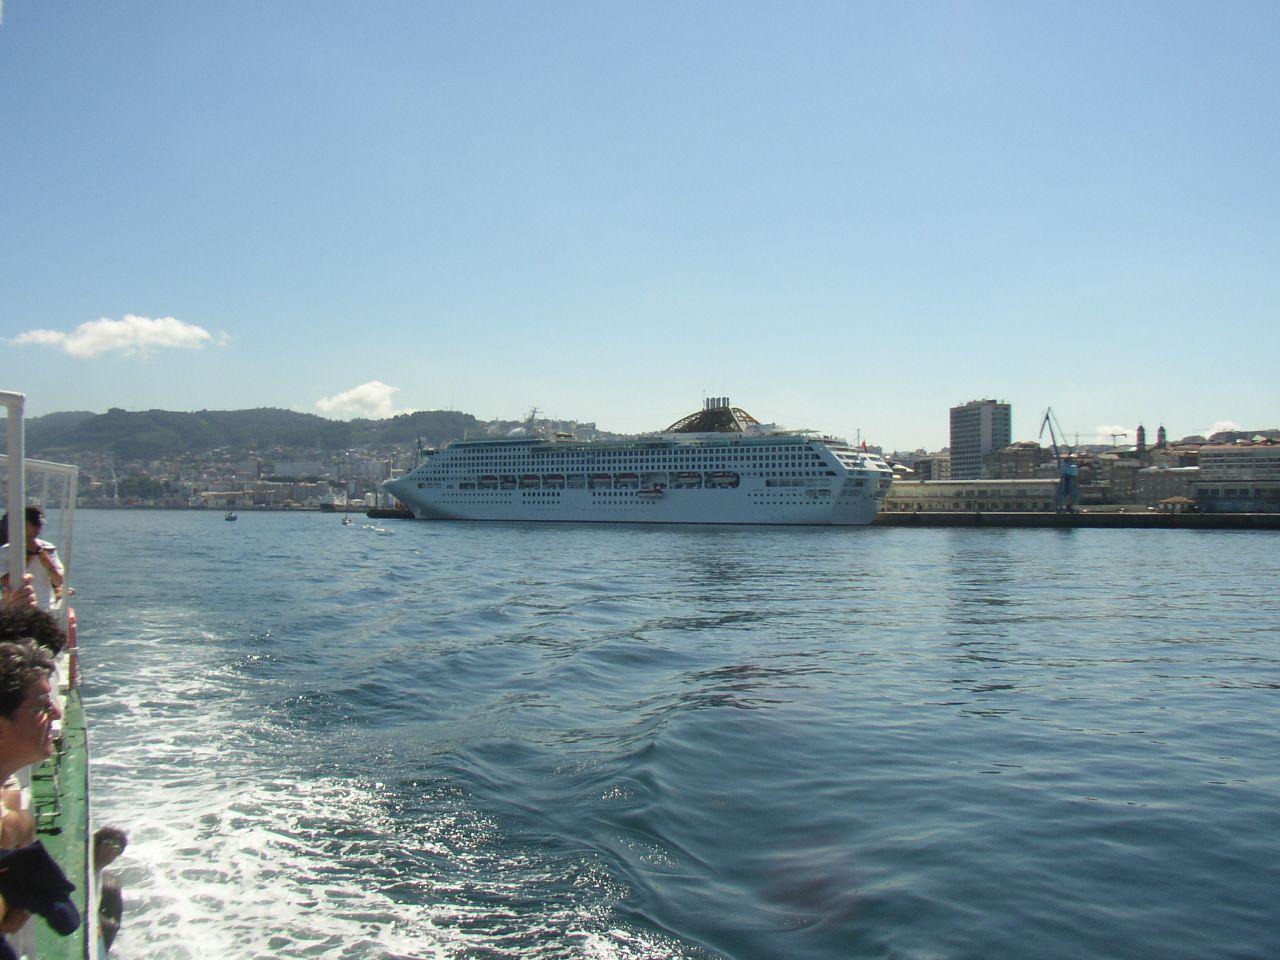 By José Antonio Gil Martínez from Vigo, Spain (Puerto de Vigo Uploaded by tm) [CC BY 2.0 (http://creativecommons.org/licenses/by/2.0)], via Wikimedia Commons0